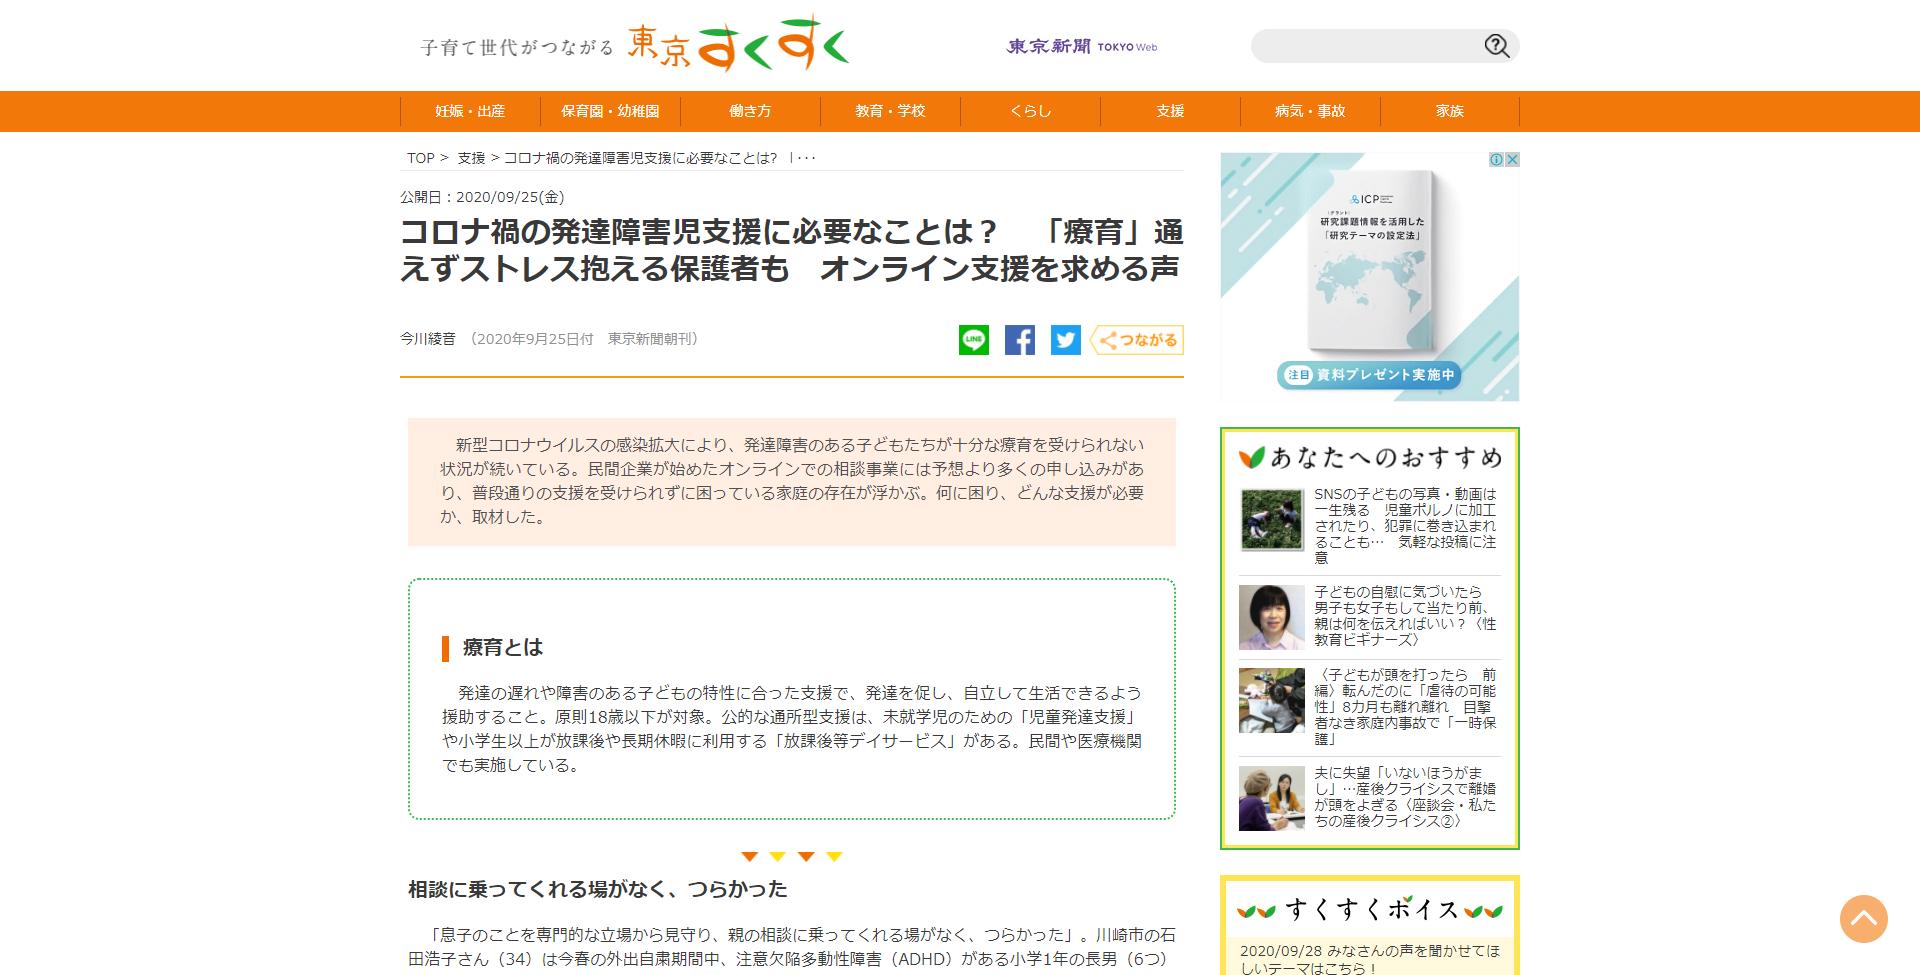 FireShot Capture 1006 - コロナ禍の発達障害児支援に必要なことは? 「療育」通えずストレス抱える保護者も オンライン支援を求める声 - 子育て世代がつながる - _ - sukusuku.tokyo-np.co.jp